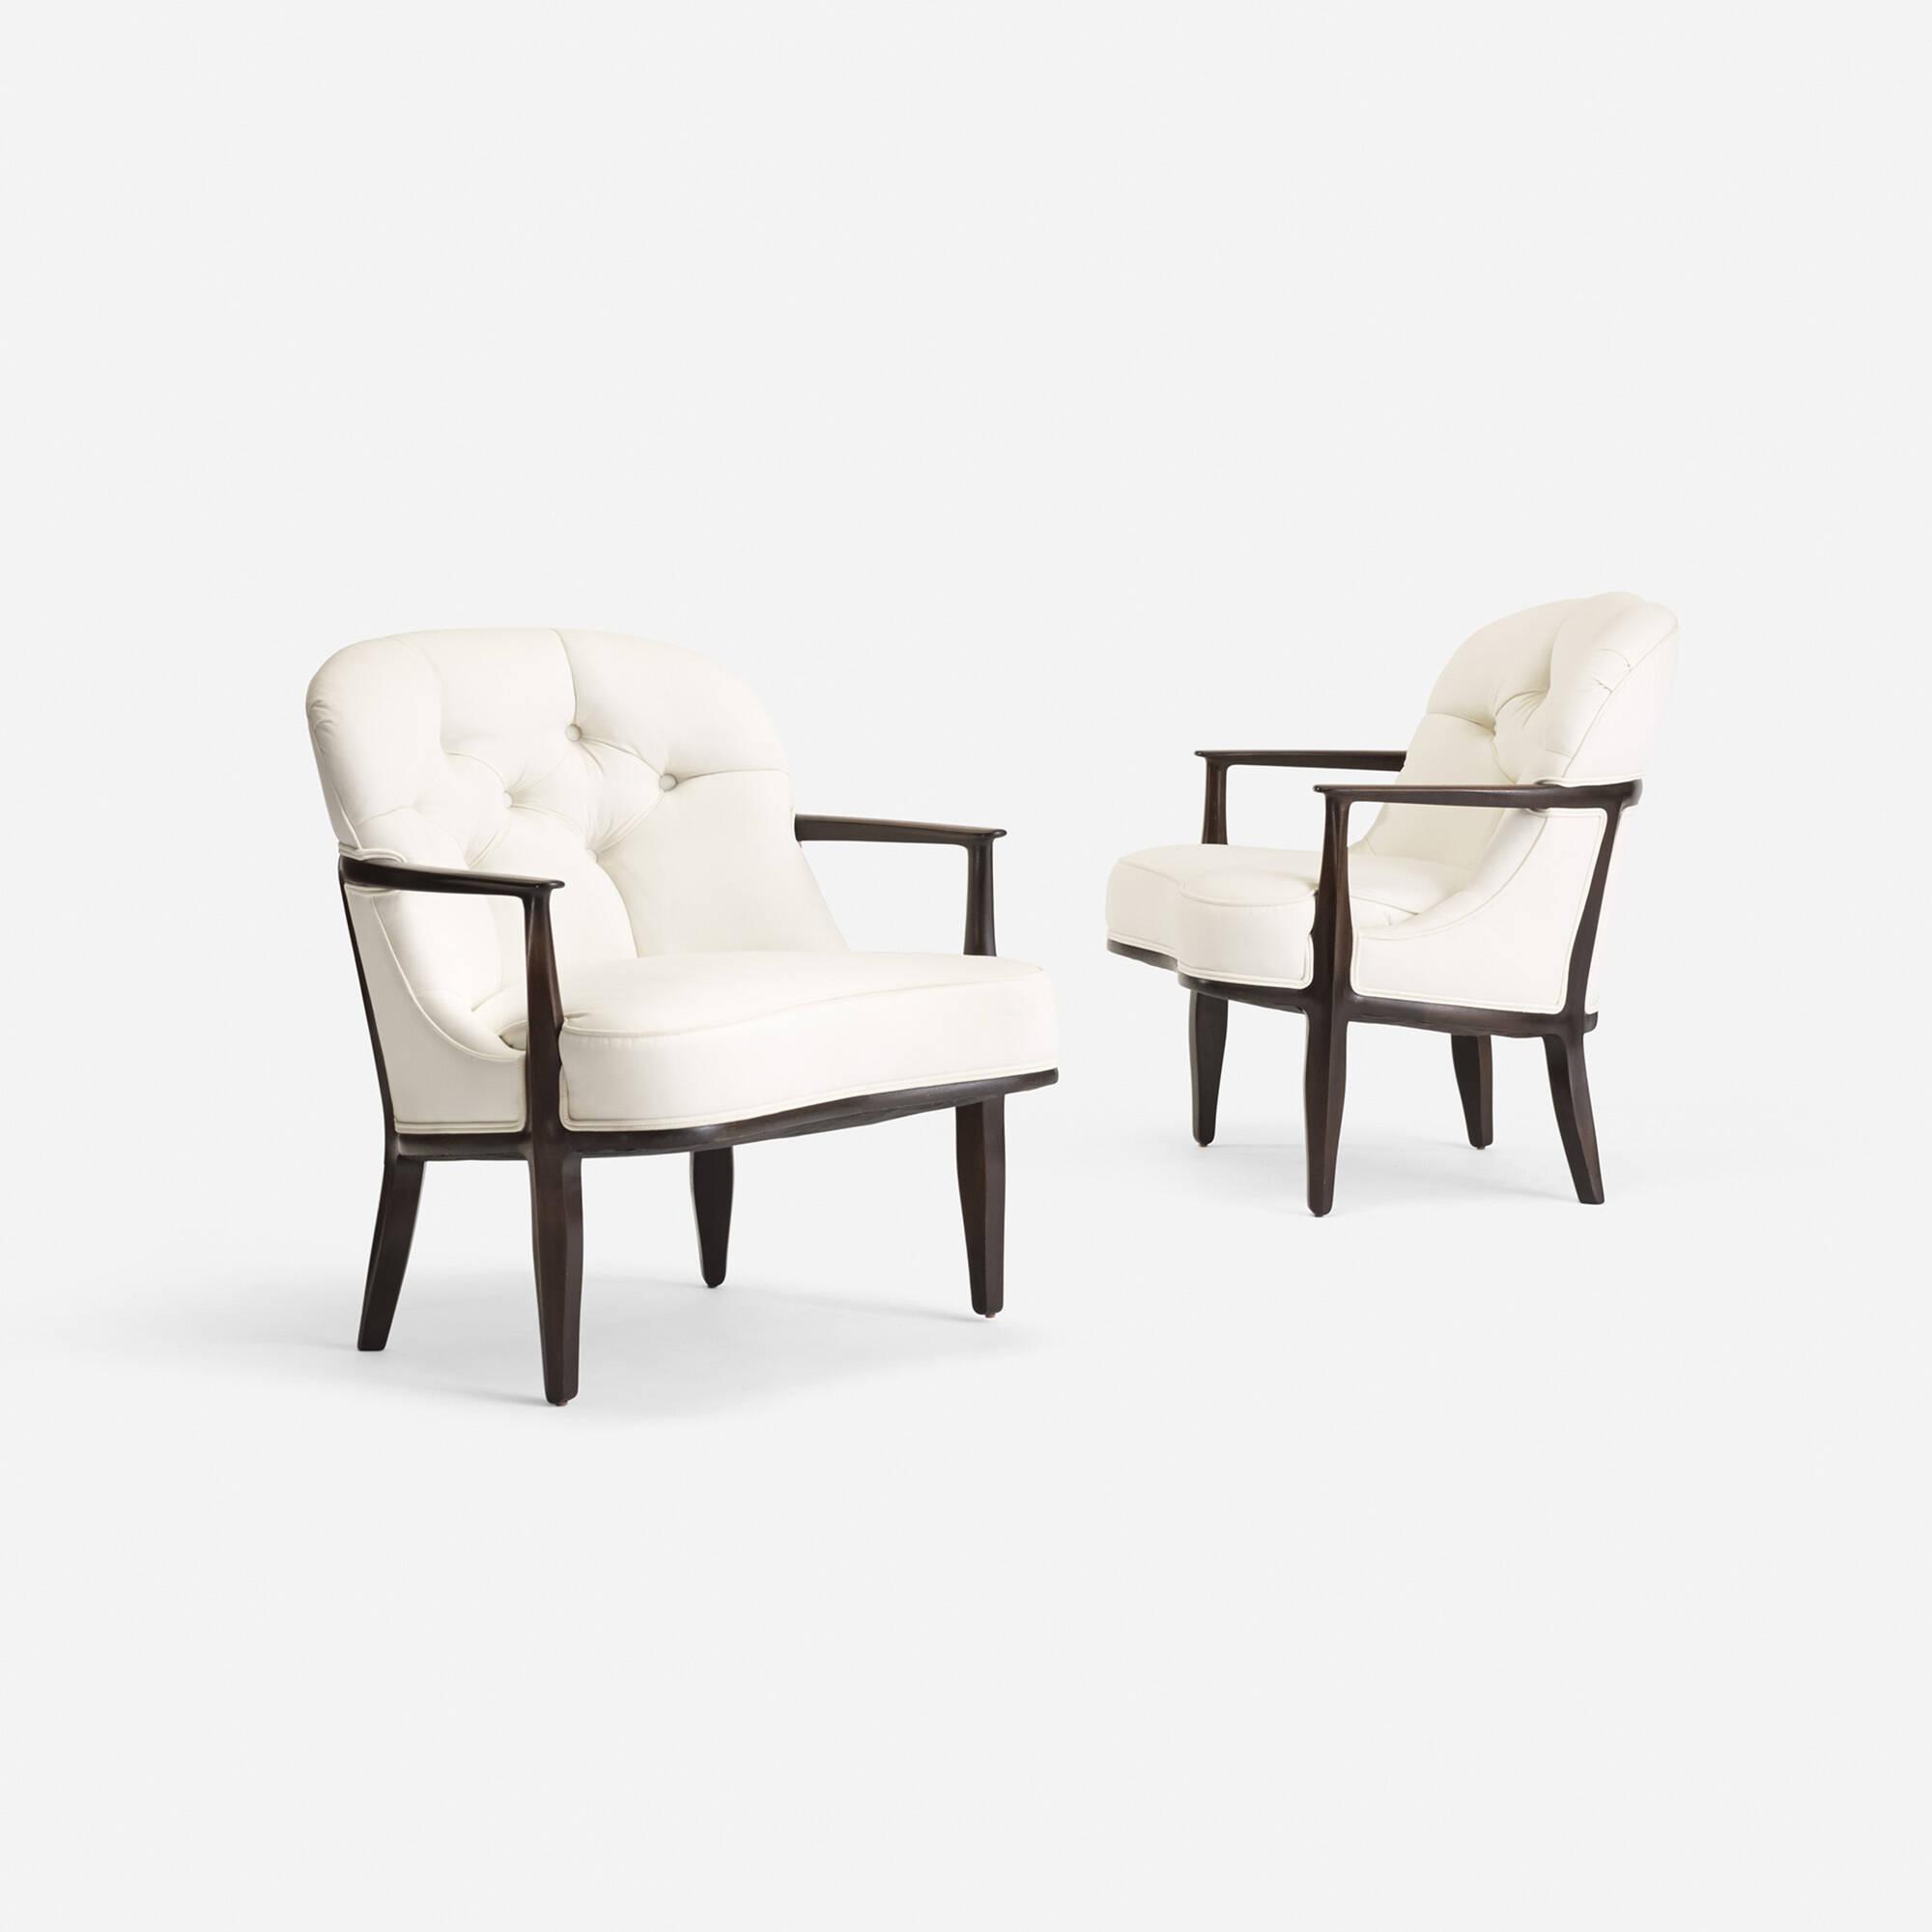 314 Edward Wormley Janus lounge chairs model 5705 pair